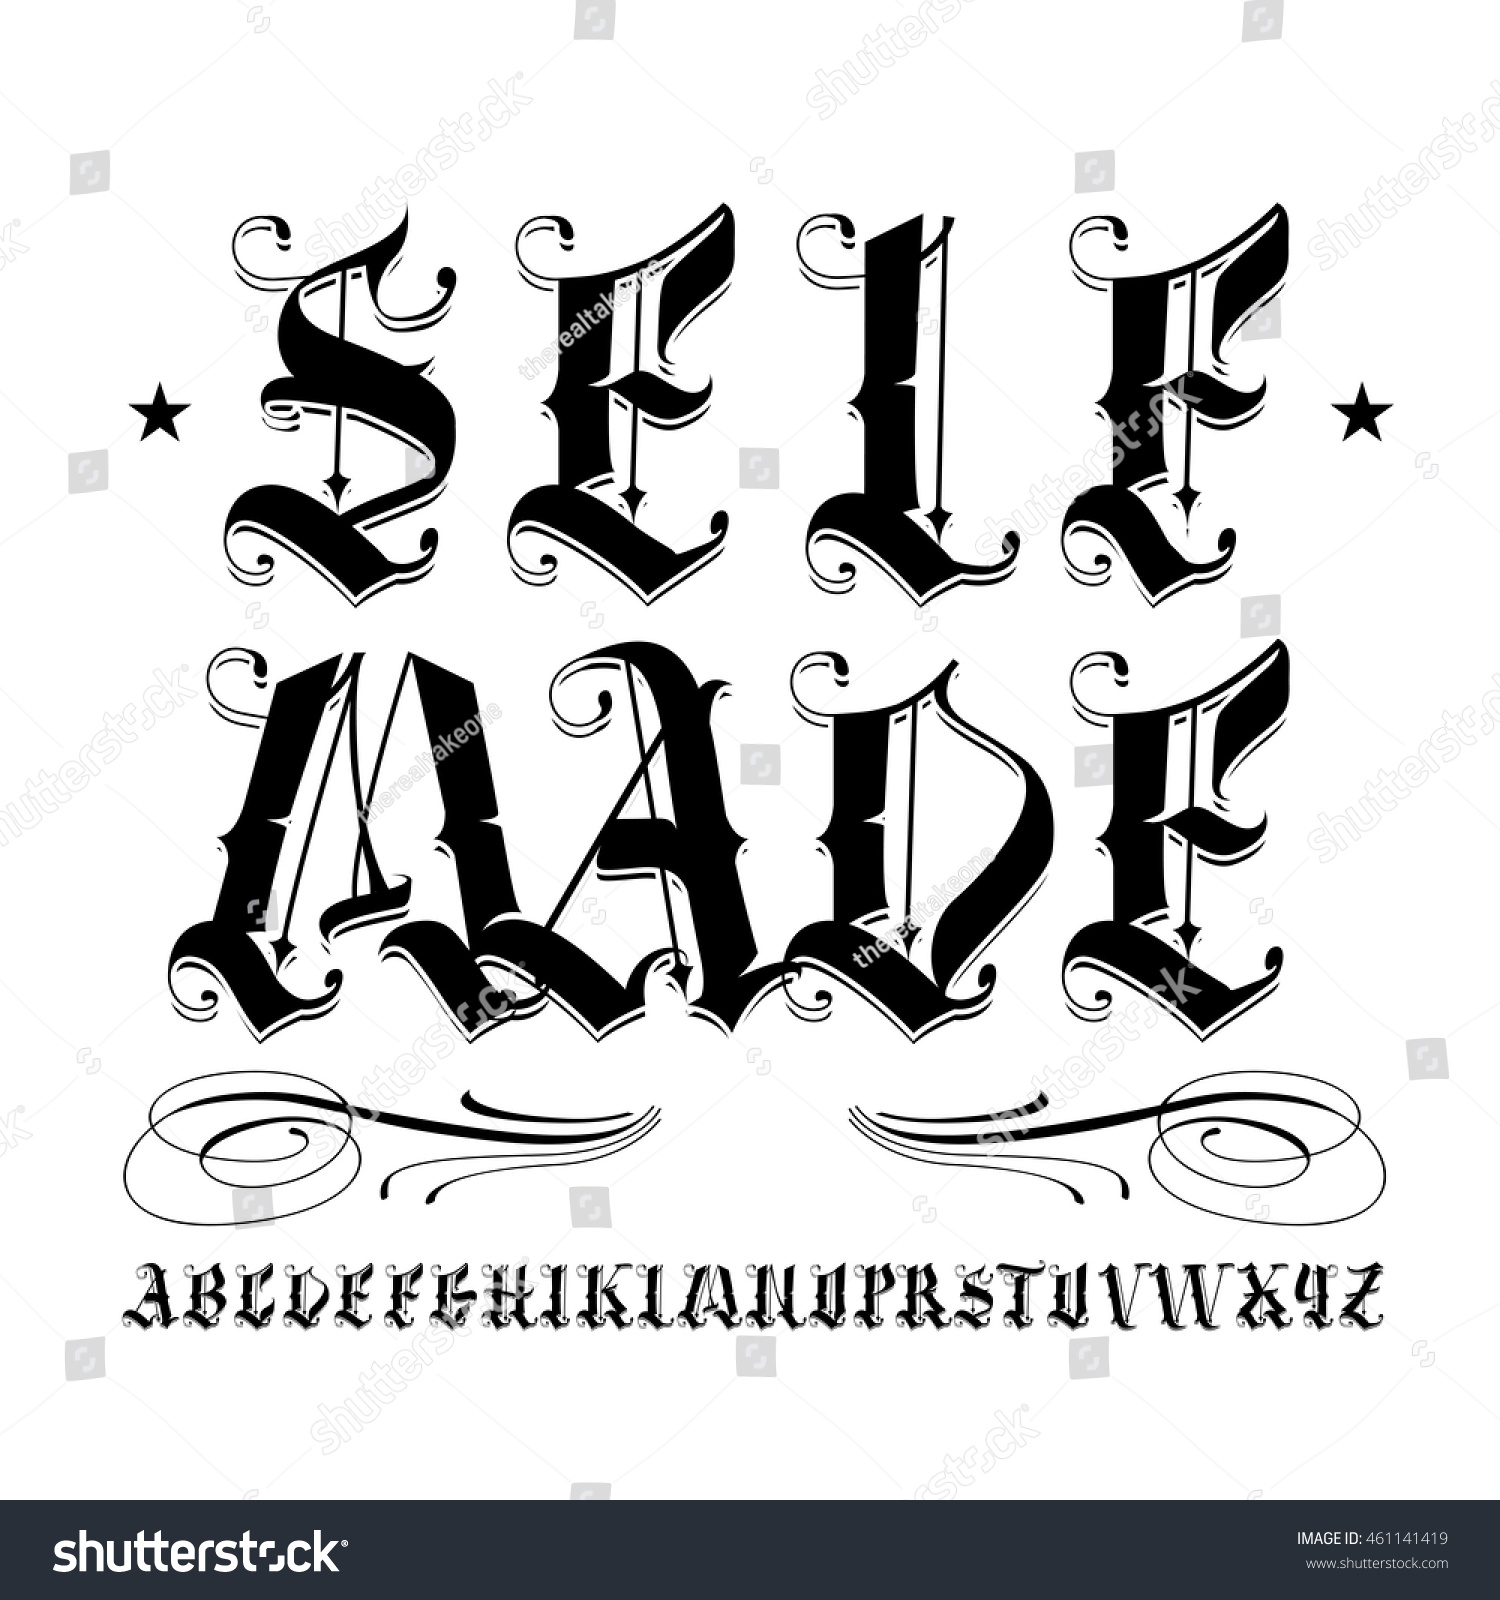 Famous Tattoo Old English Vector Lettering Stockvector Rechtenvrij